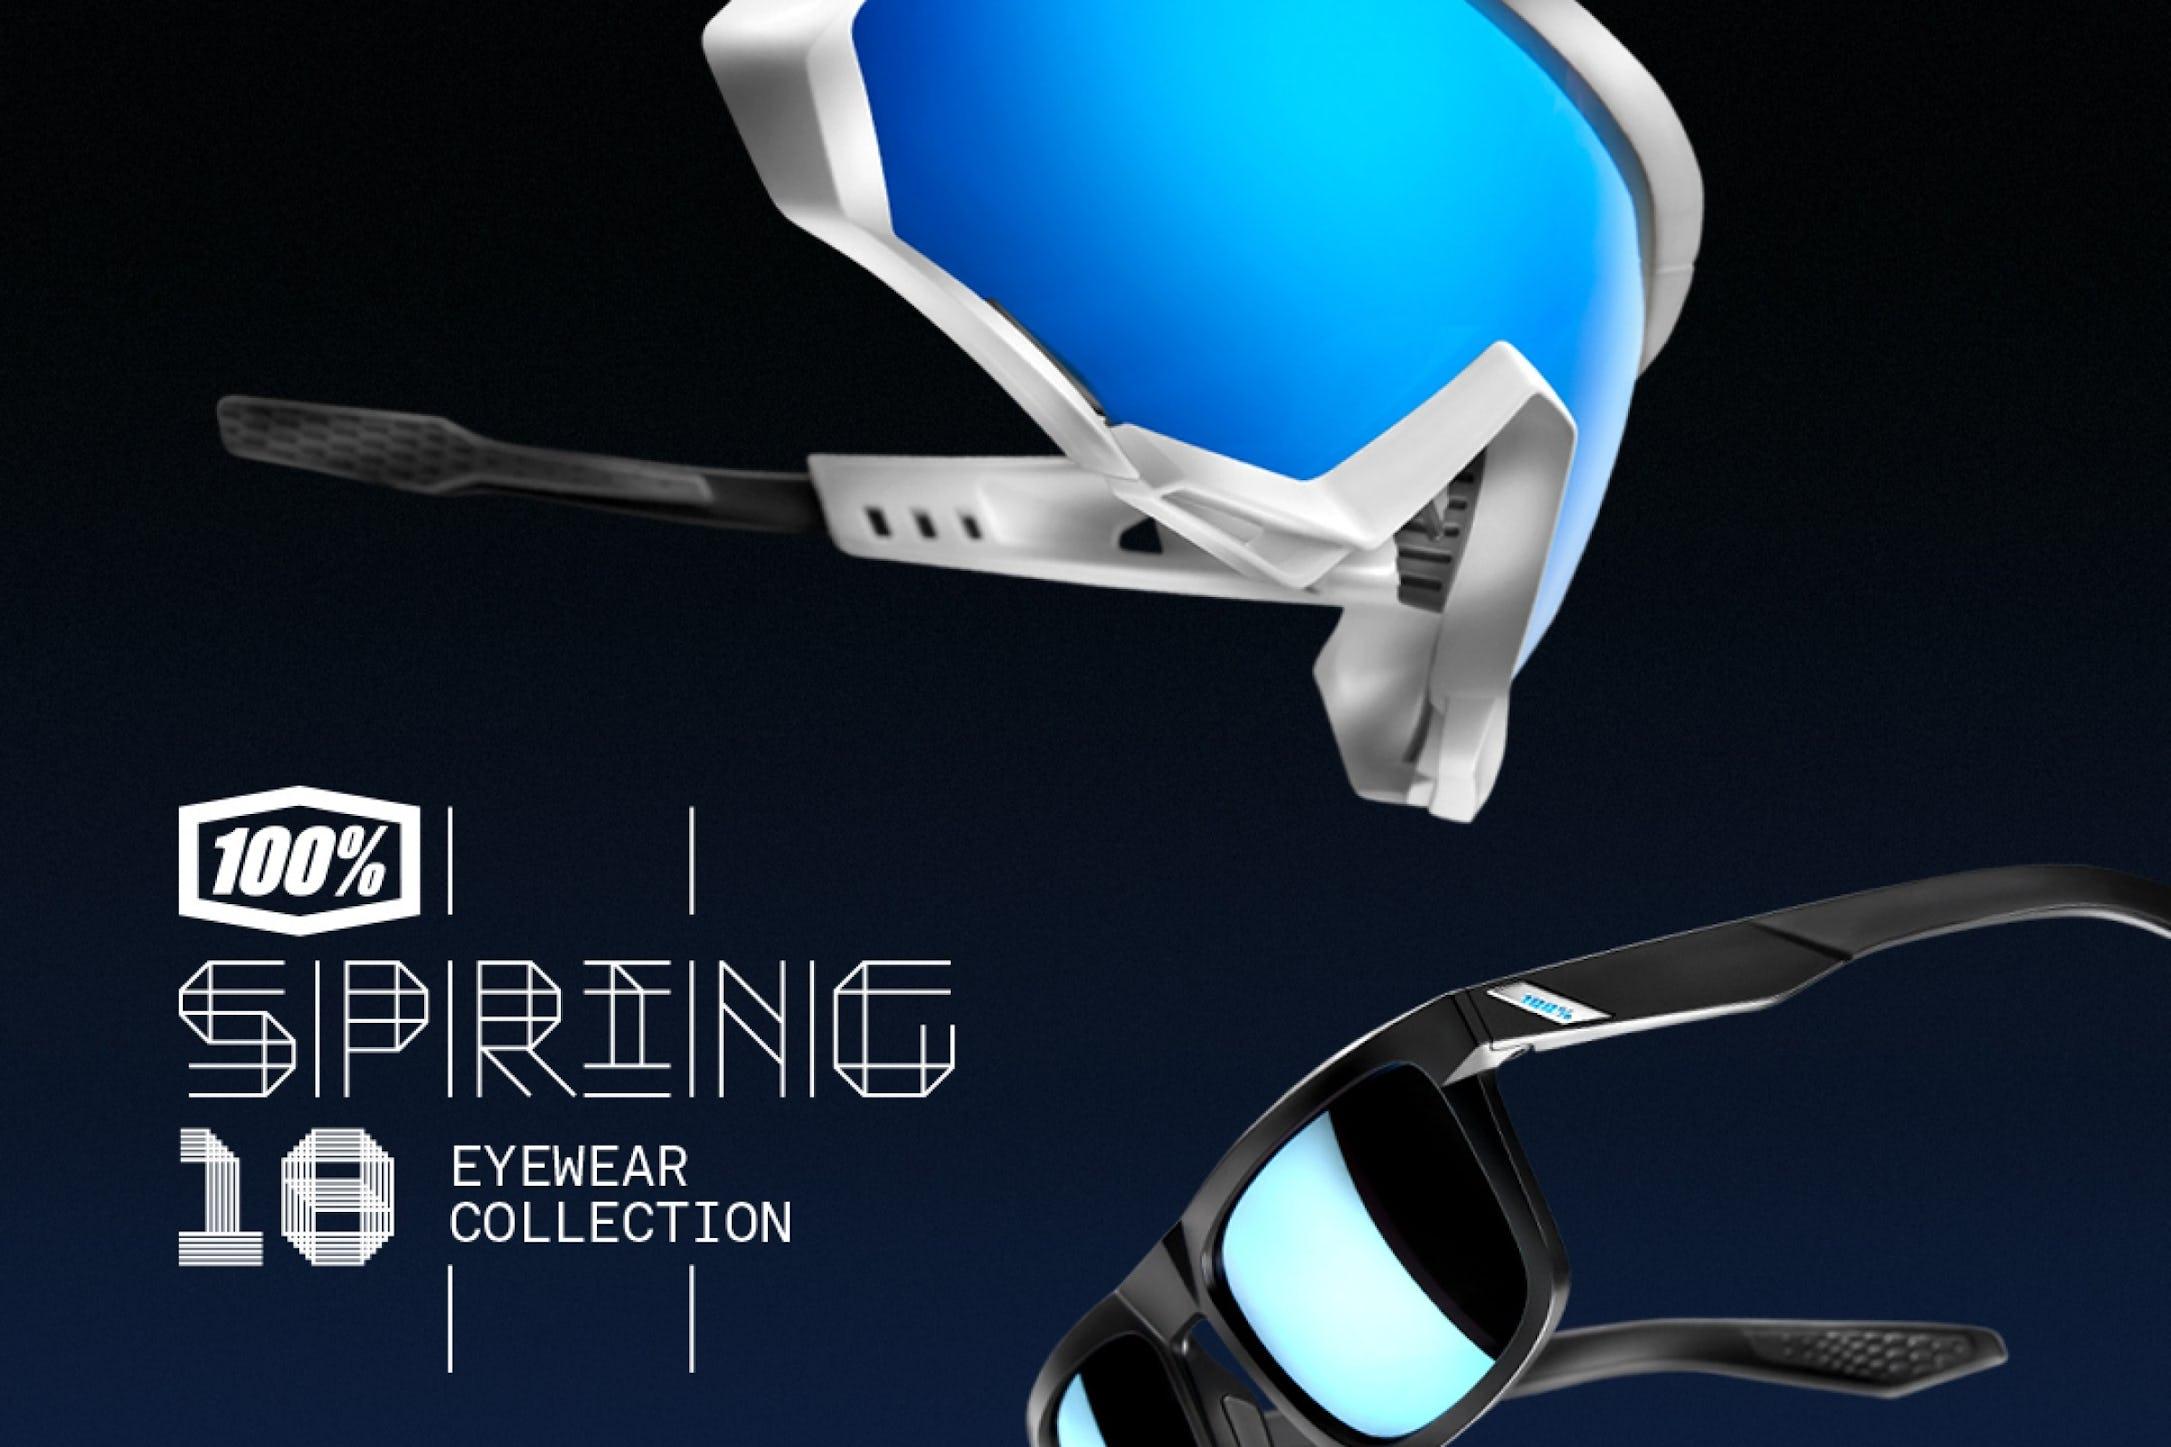 c41479c67c 100% Introduces Spring Eyewear Collection - Racer X Online